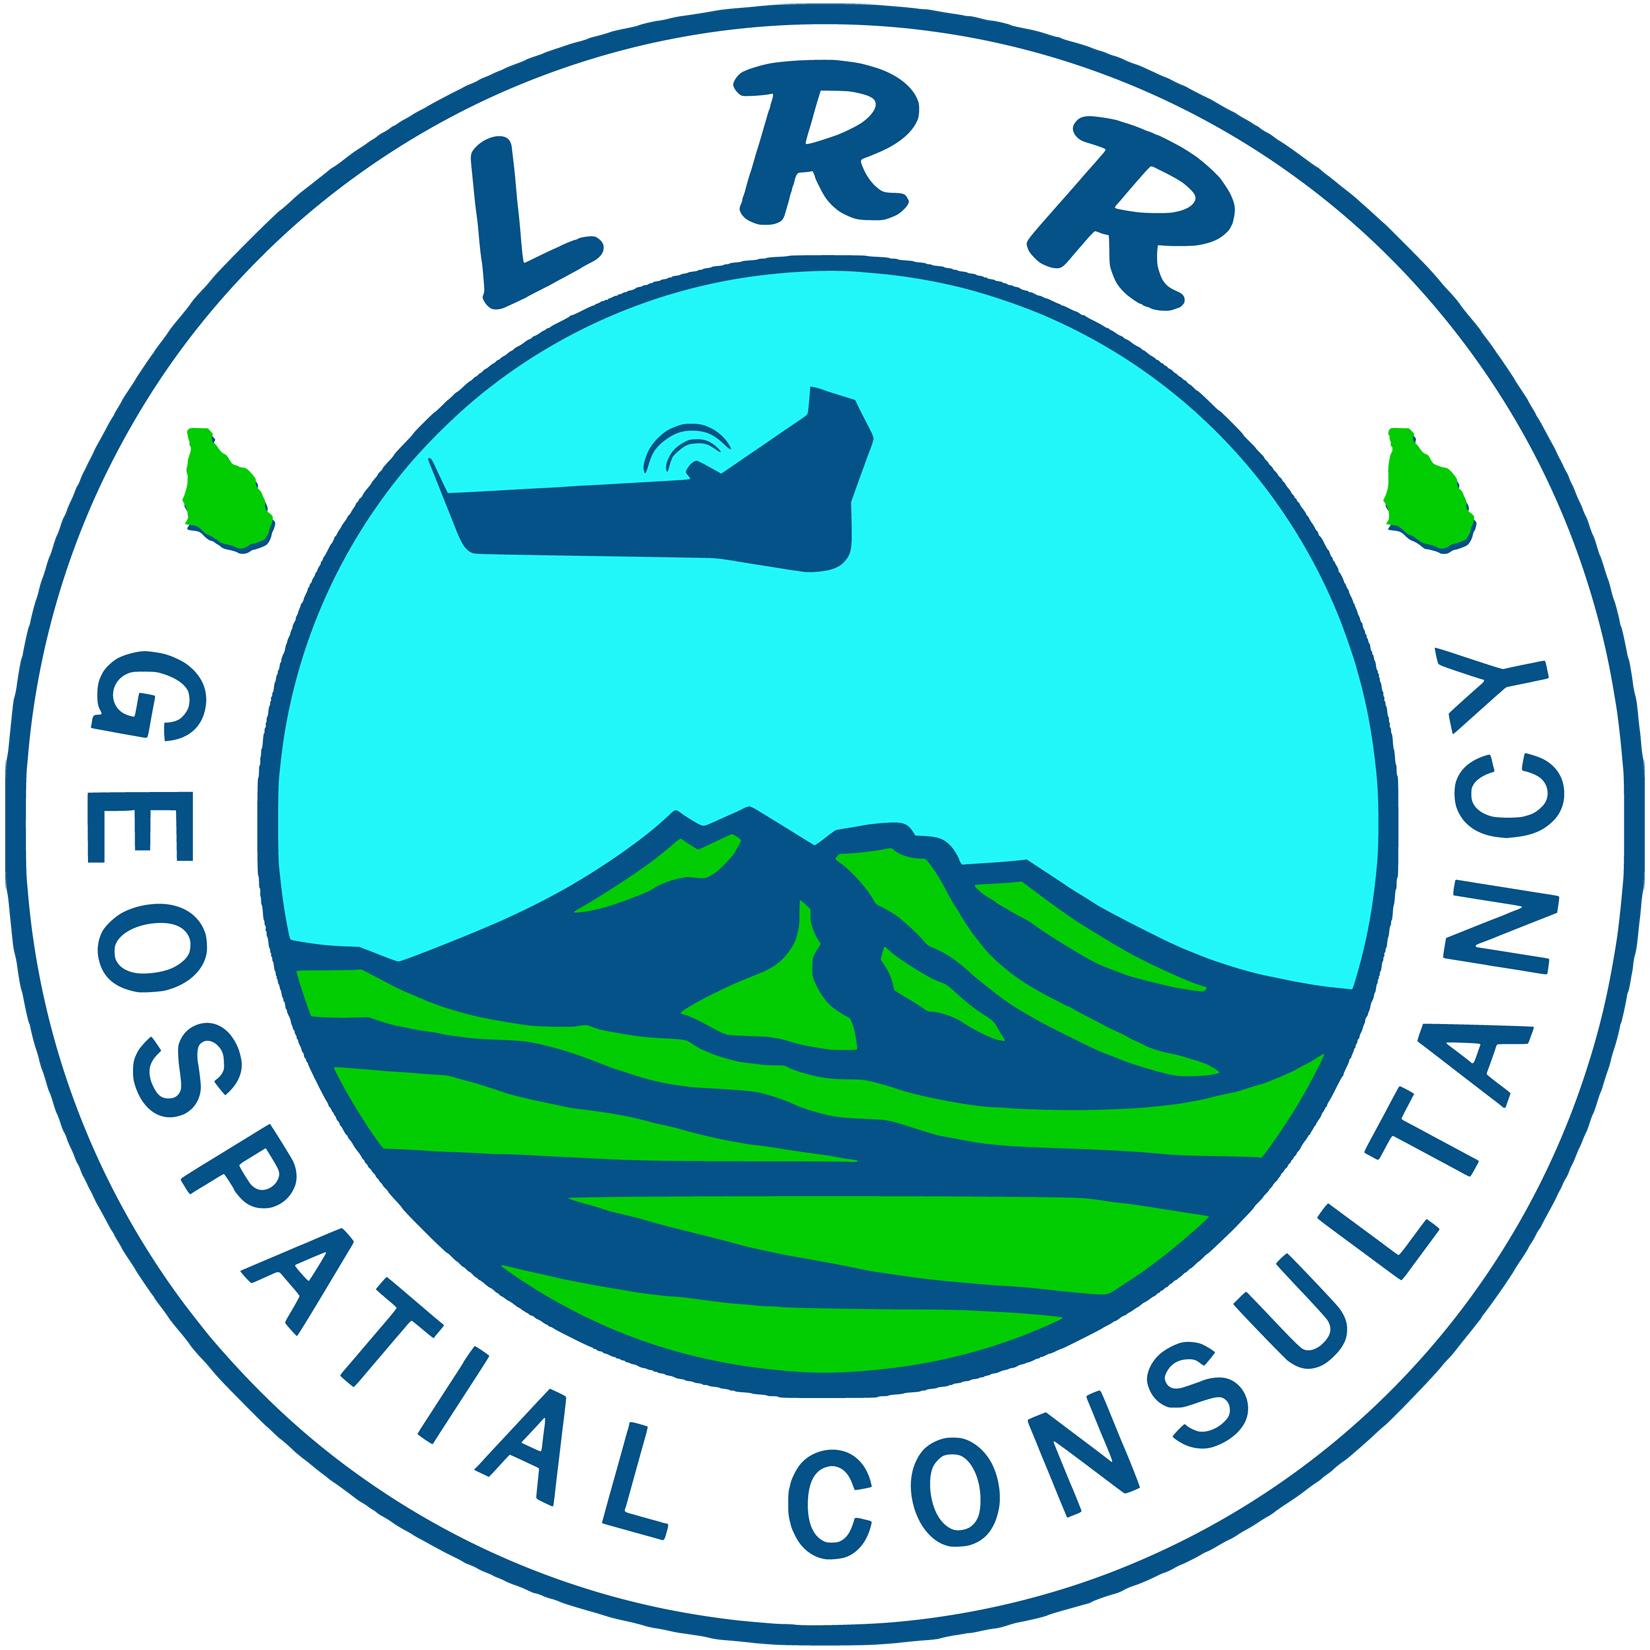 LRR Geospatial Consultancy